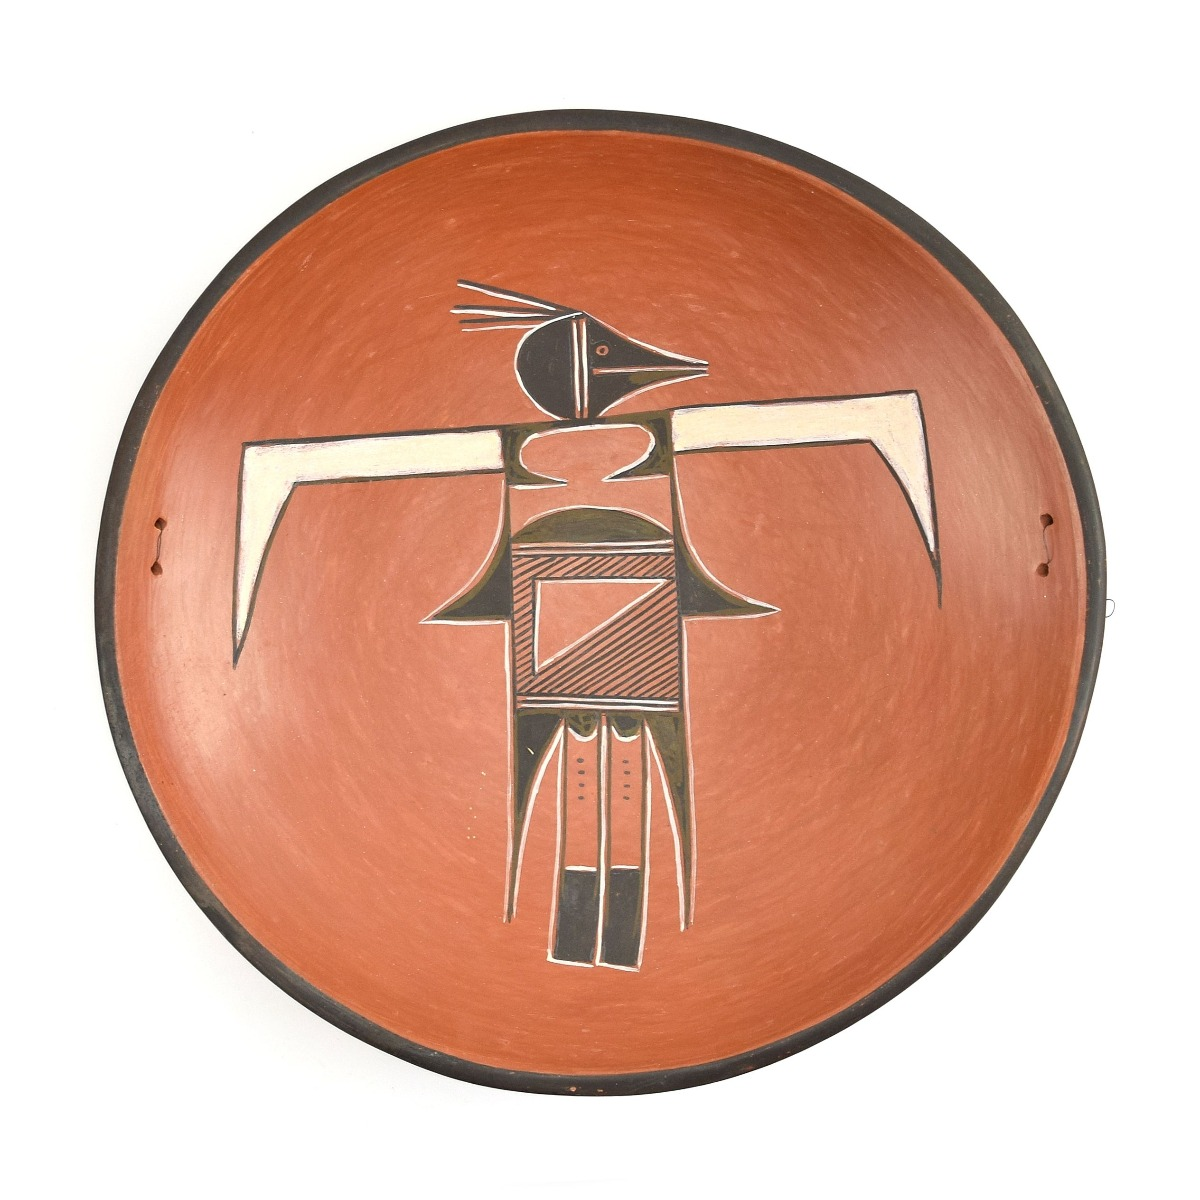 Garnet Pavatea - Hopi Bowl with Thunderbird Design